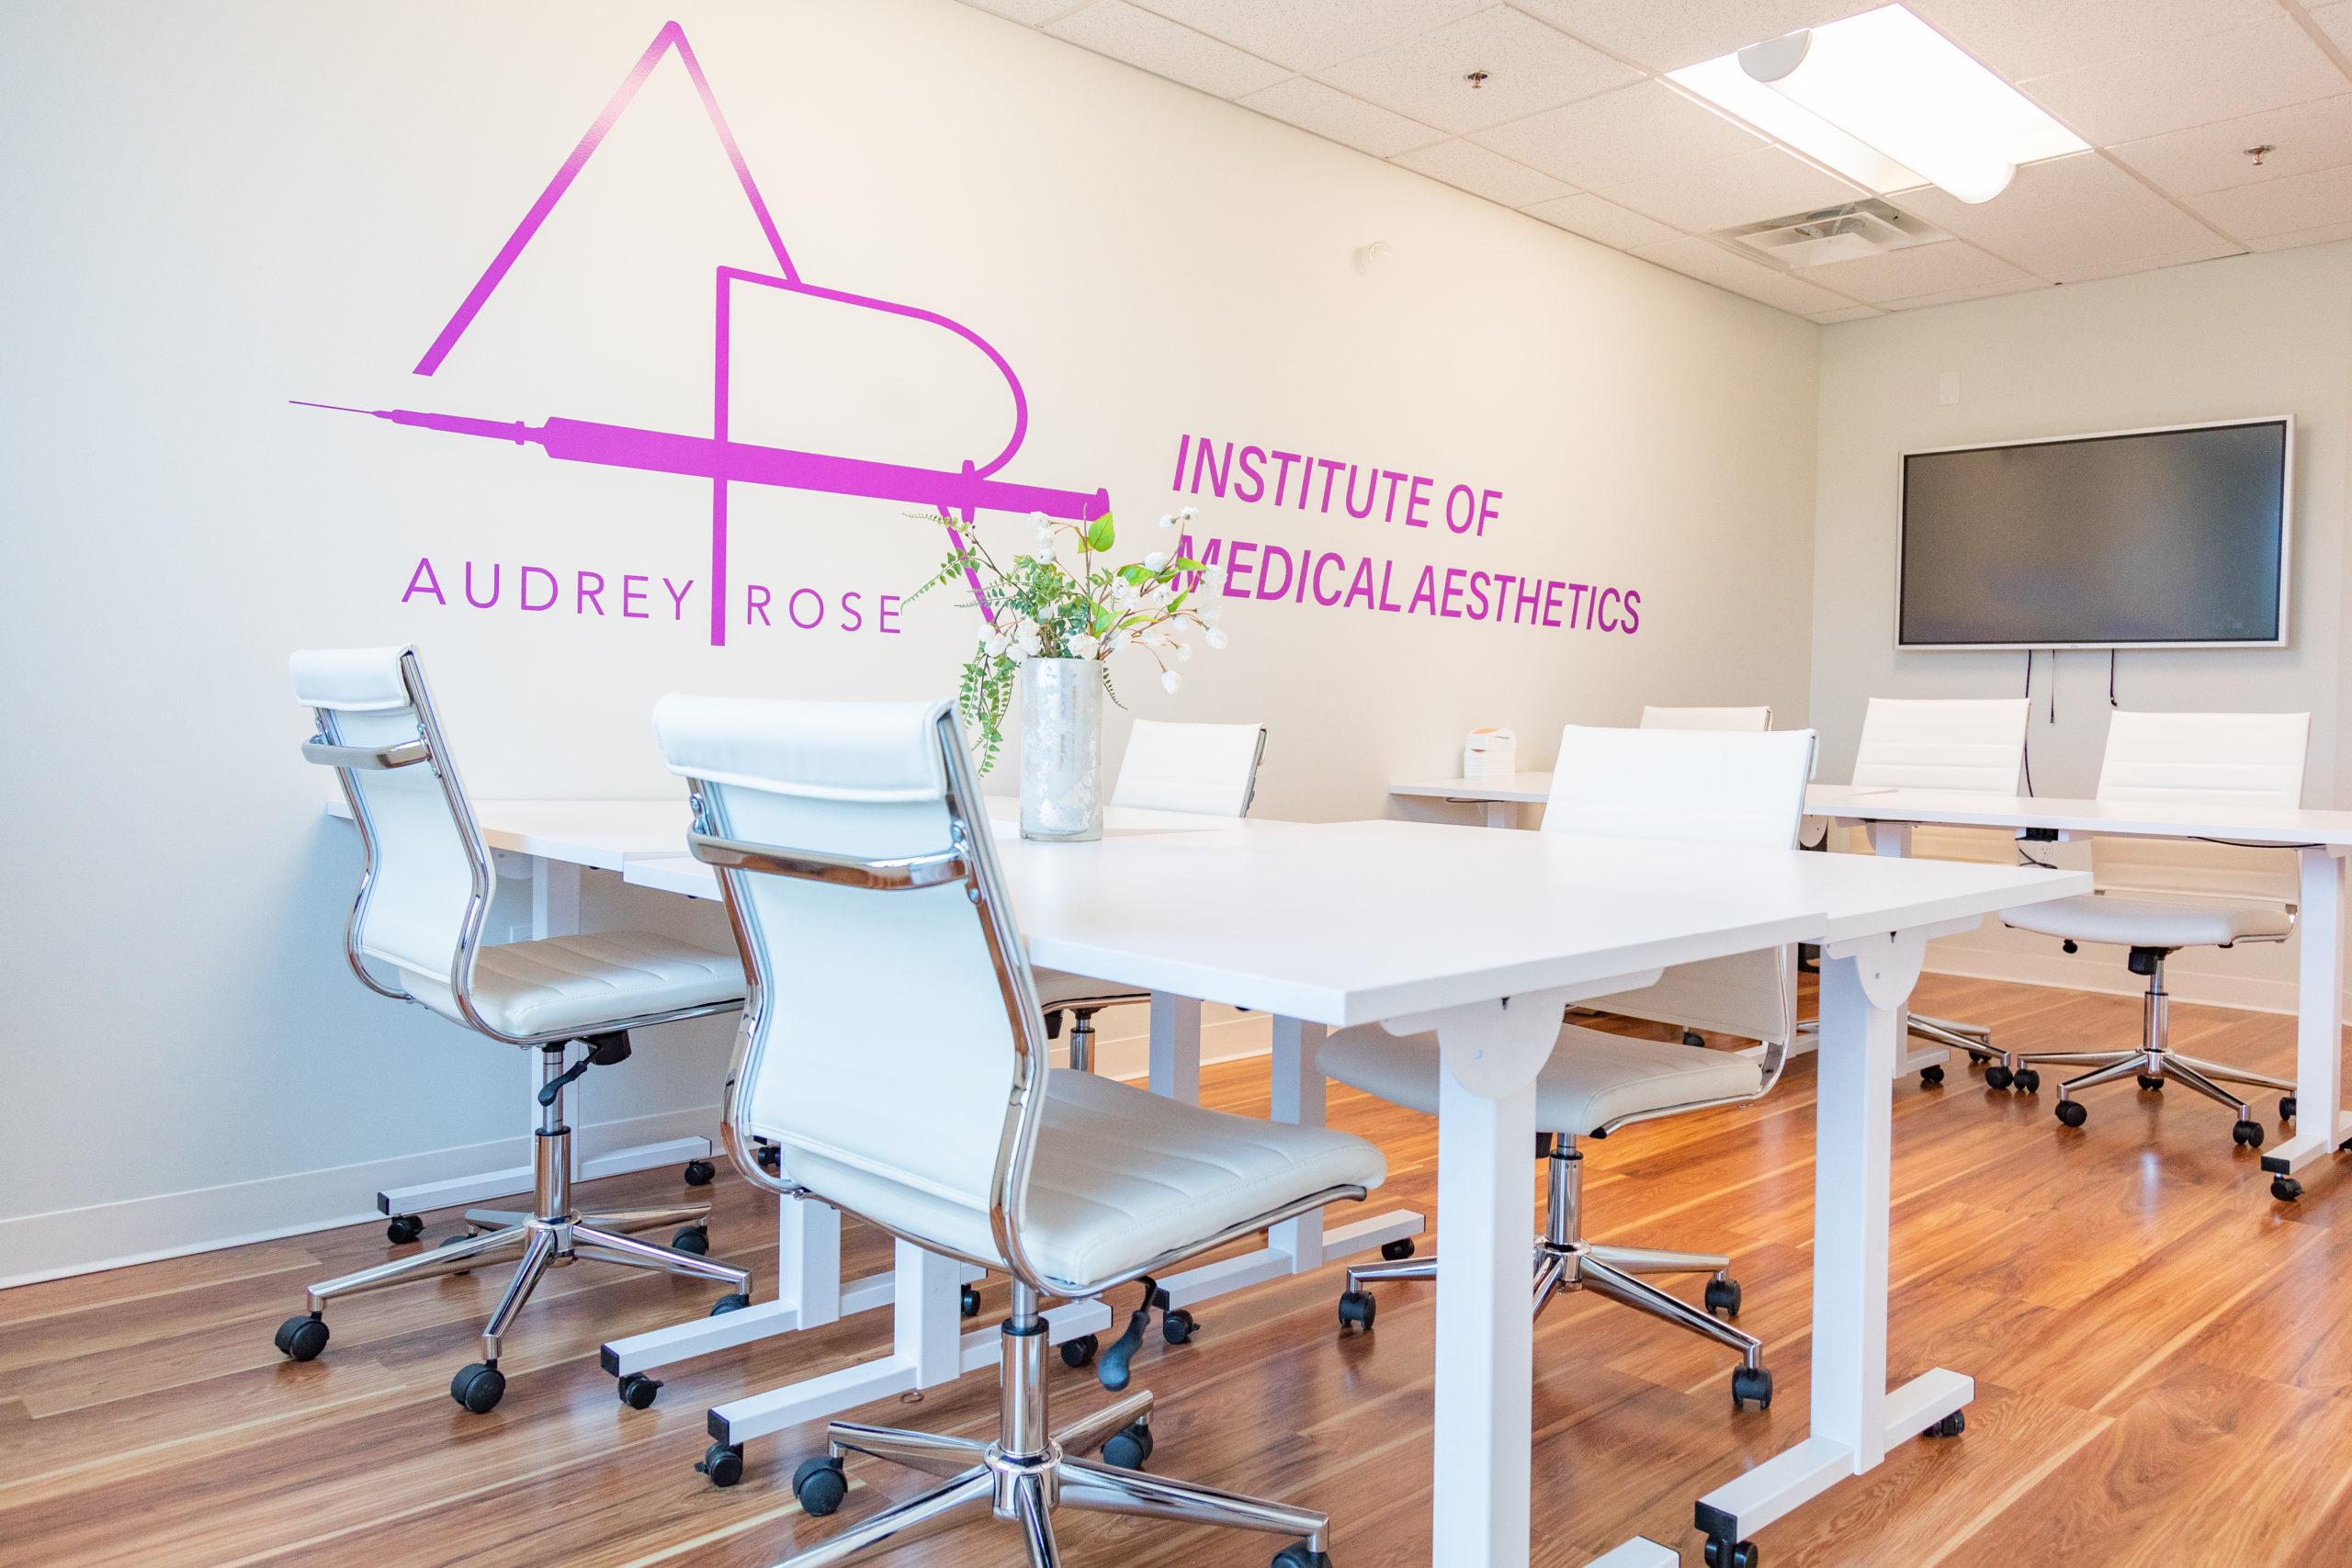 Join ARI Network_ Audrey rose of institute of medical aesthetics